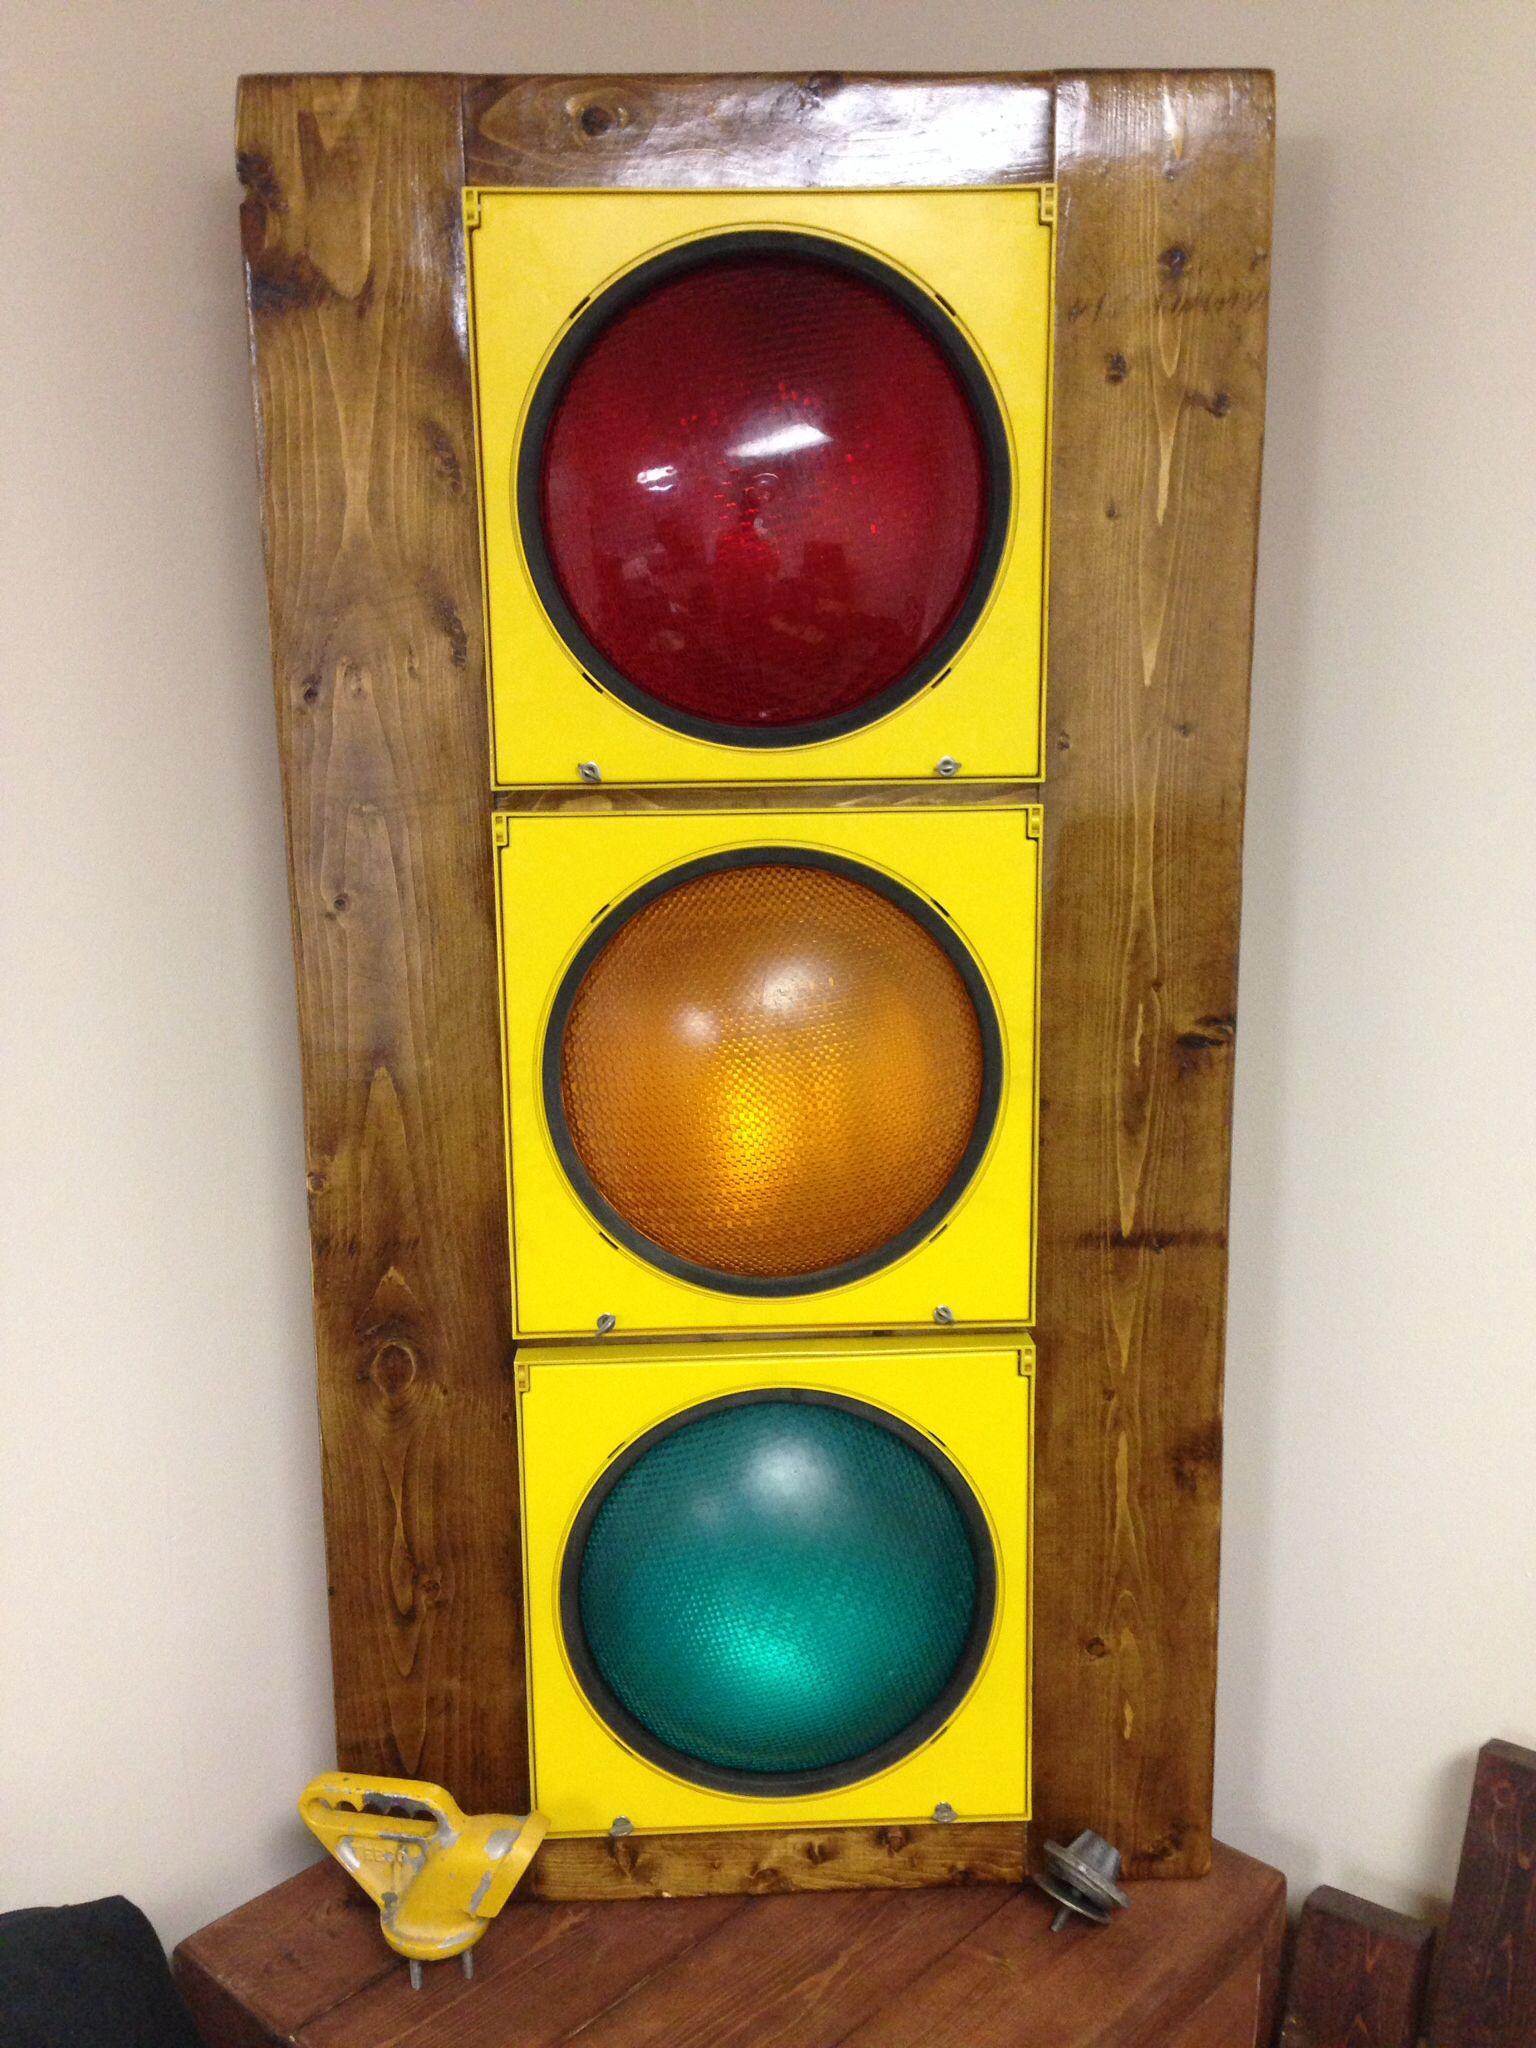 Lighting Basement Washroom Stairs: Custom Traffic Light. Wired To Light Switch For Each Light